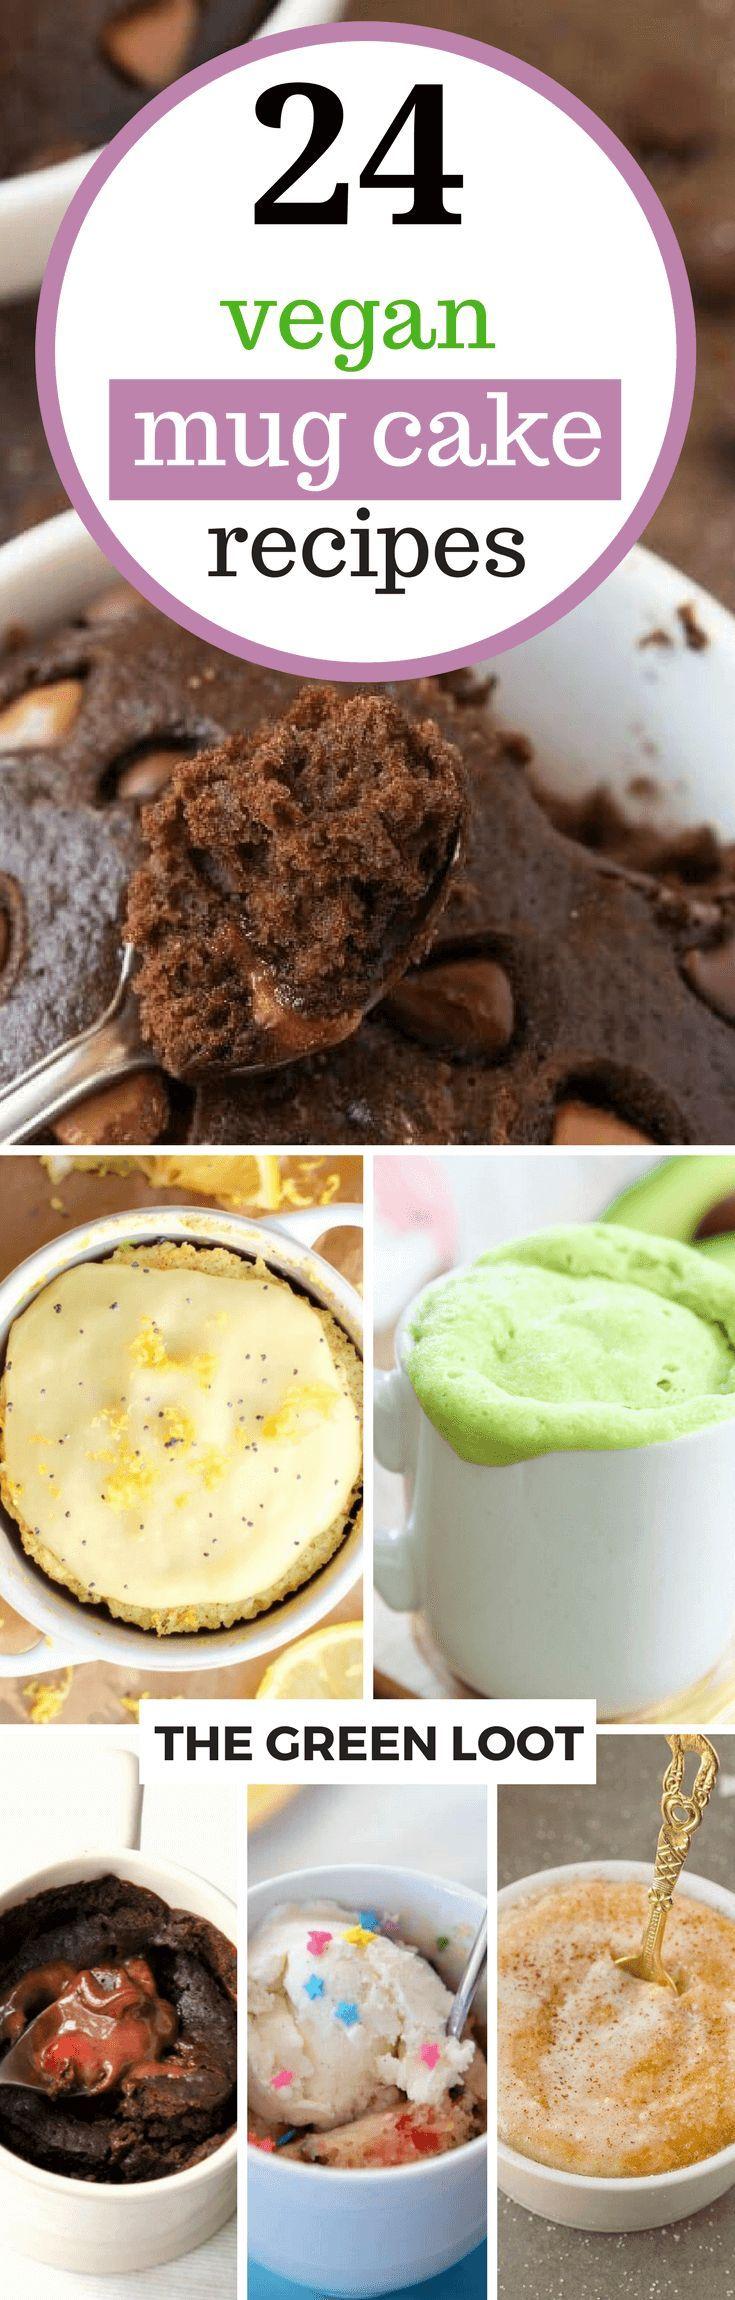 24 Easy Vegan Mug Cake Recipes in The Microwave | Vegan ...